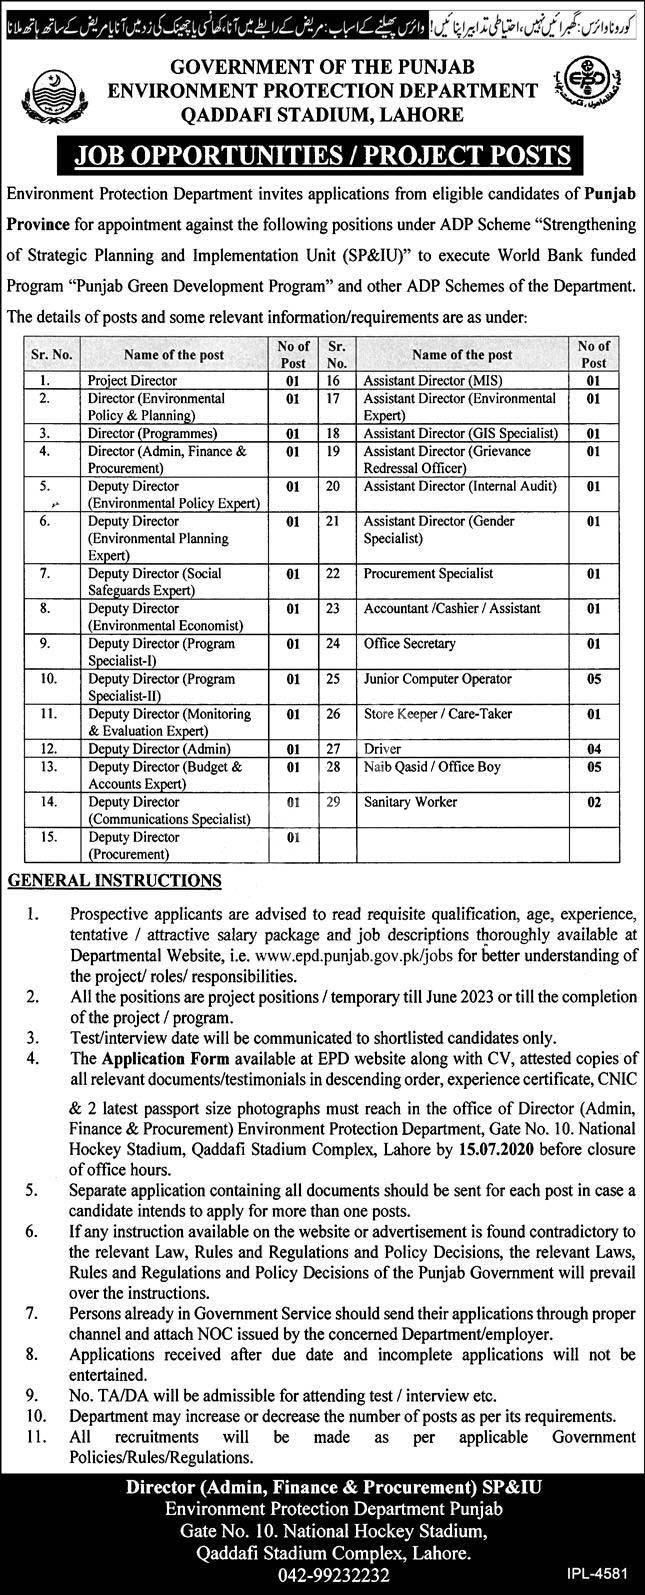 Punjab Environment Protection Department Qaddafi Stadium Lahore Jobs 2020 Latest